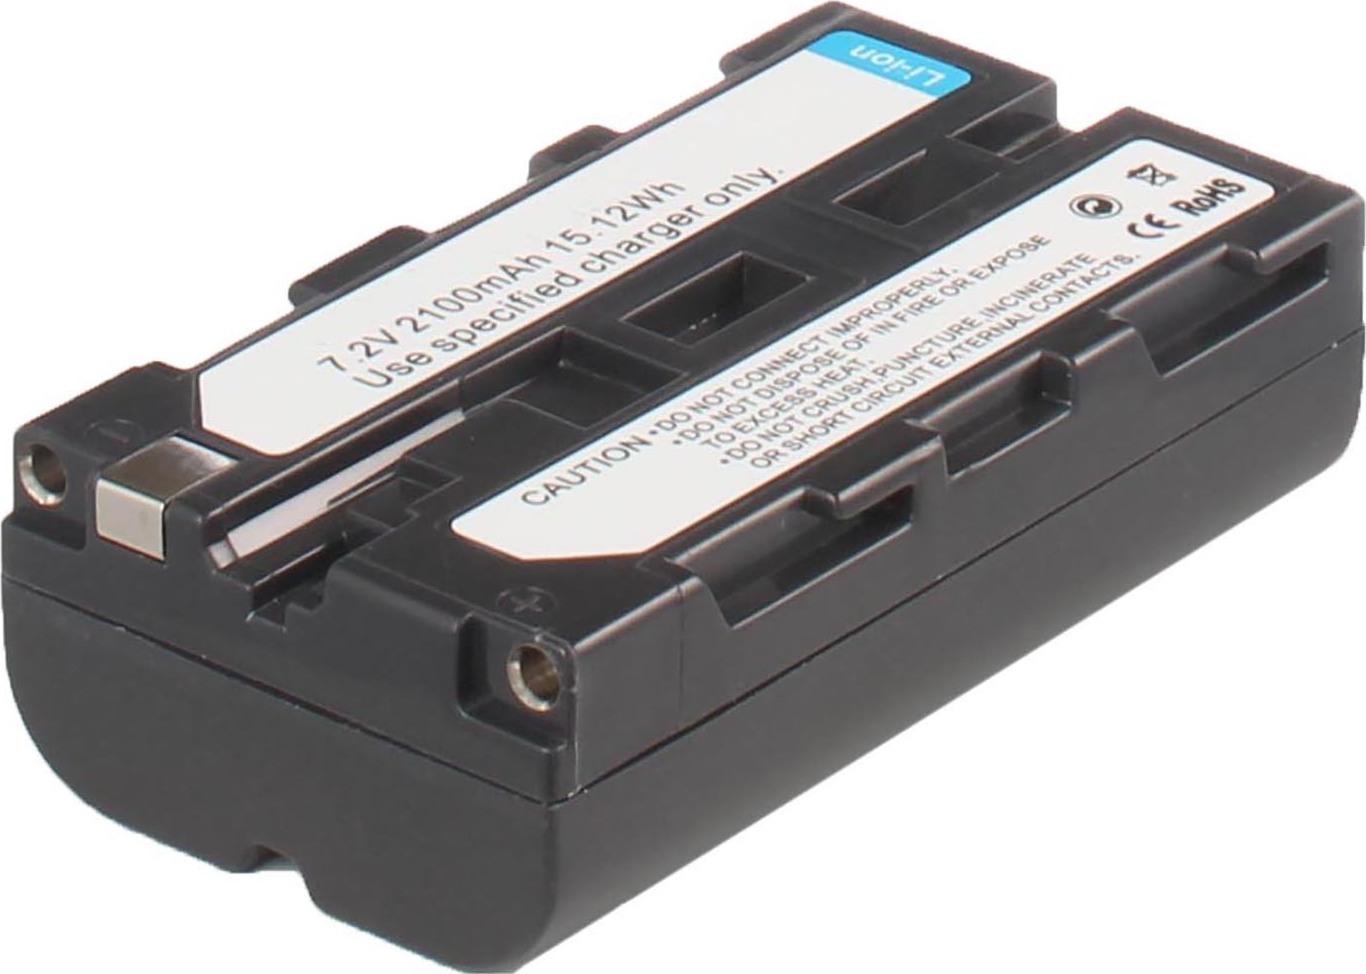 Аккумуляторная батарея iBatt iB-T4-F278 2000mAh для камер Sony DCR-TRV820E, DSR-PD150, HVR-M10E, CCD-TR3000E, CCD-TR3300E, CCD-TR415E, CCD-TR417, CCD-TR512E, CCD-TR516E, CCD-TR713E, CCD-TR918E, CCD-TRV27E, CCD-TRV57E, CCD-TRV67E, DCR-TRV9, DCR-TRV900,